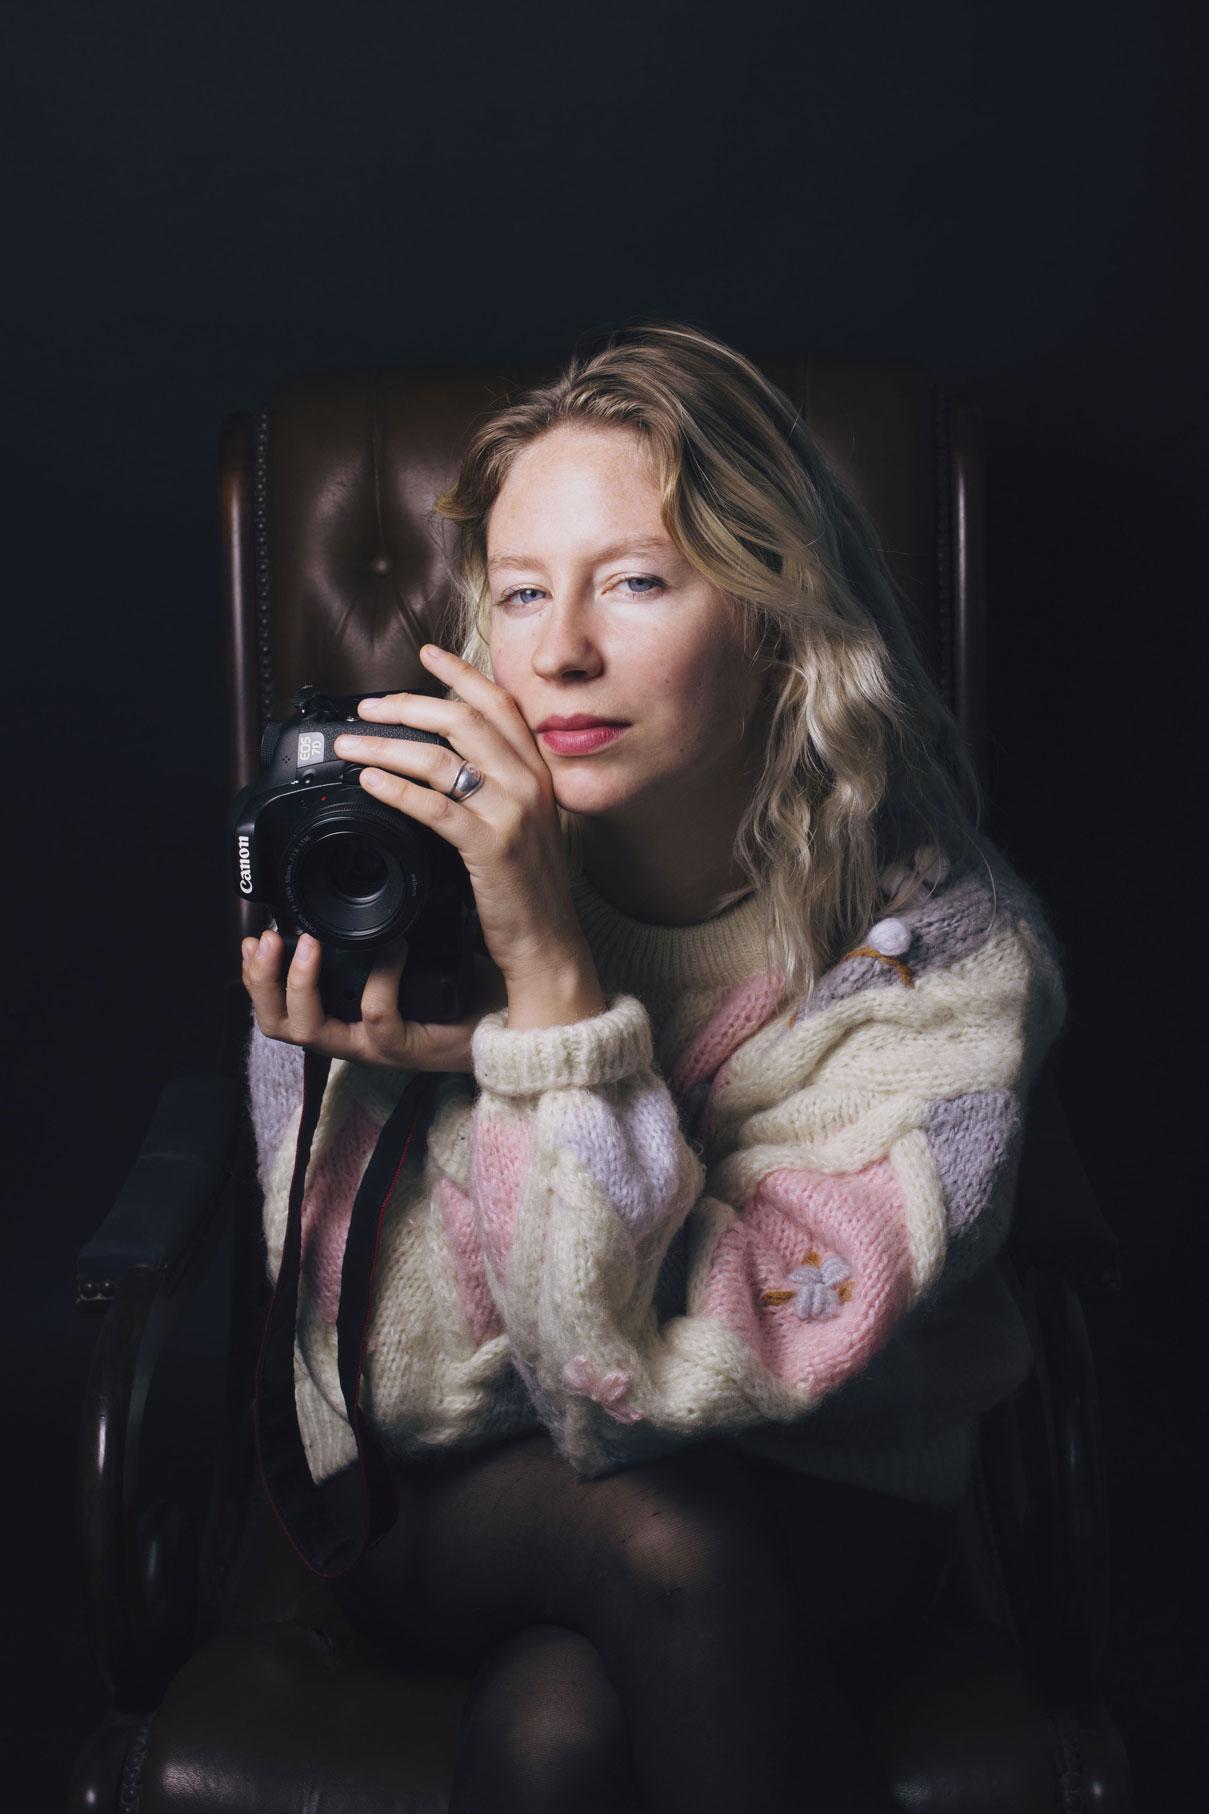 photographe portrait professionel corporate tours